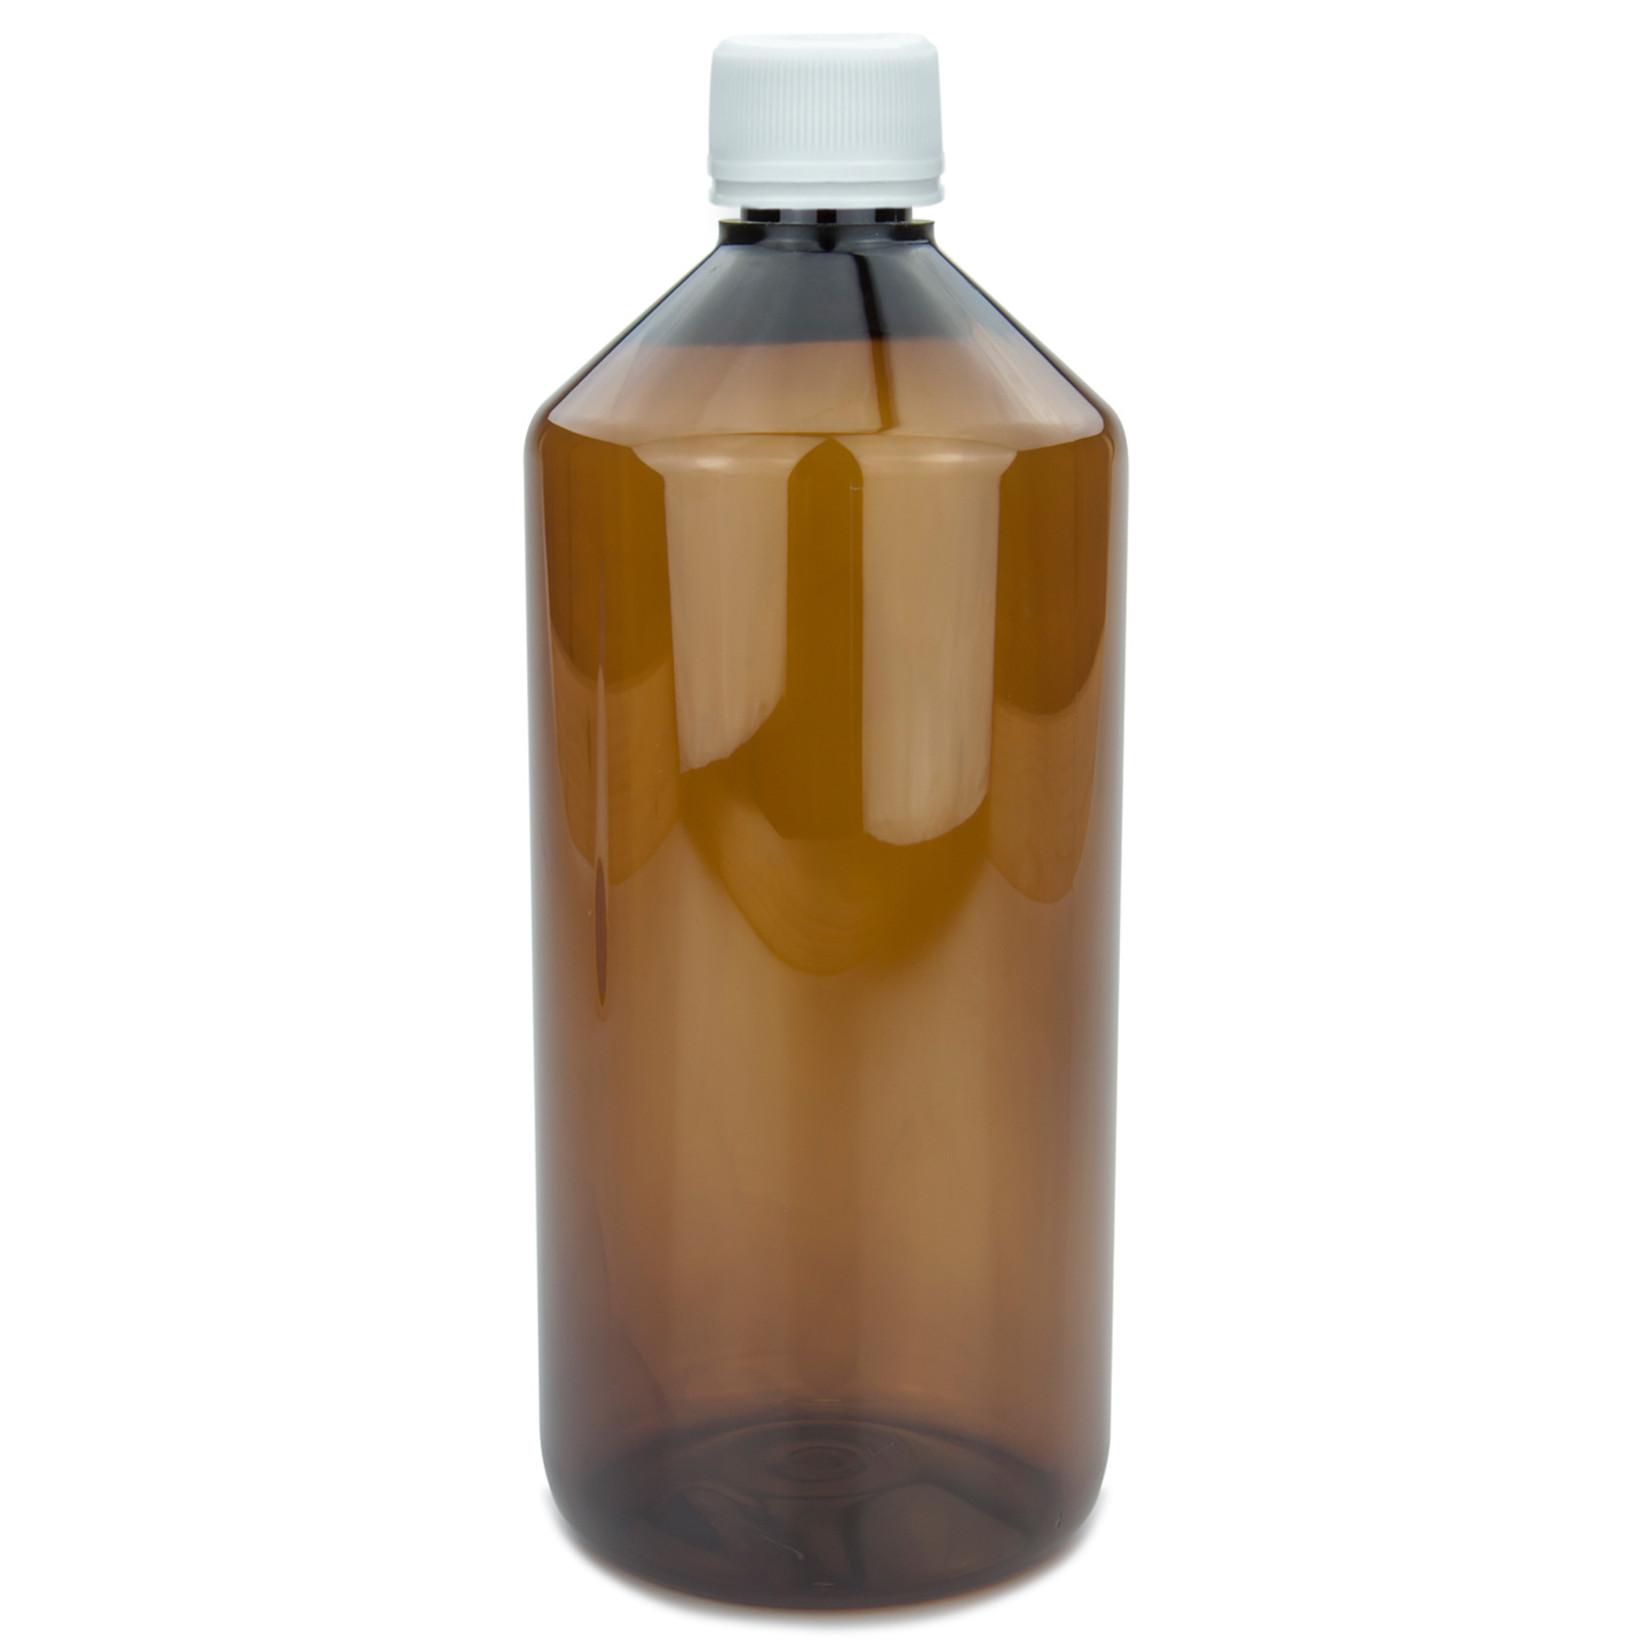 VPG 80/20 Nikotin-Salz Base 3-36 mg/ml 250-1000ml